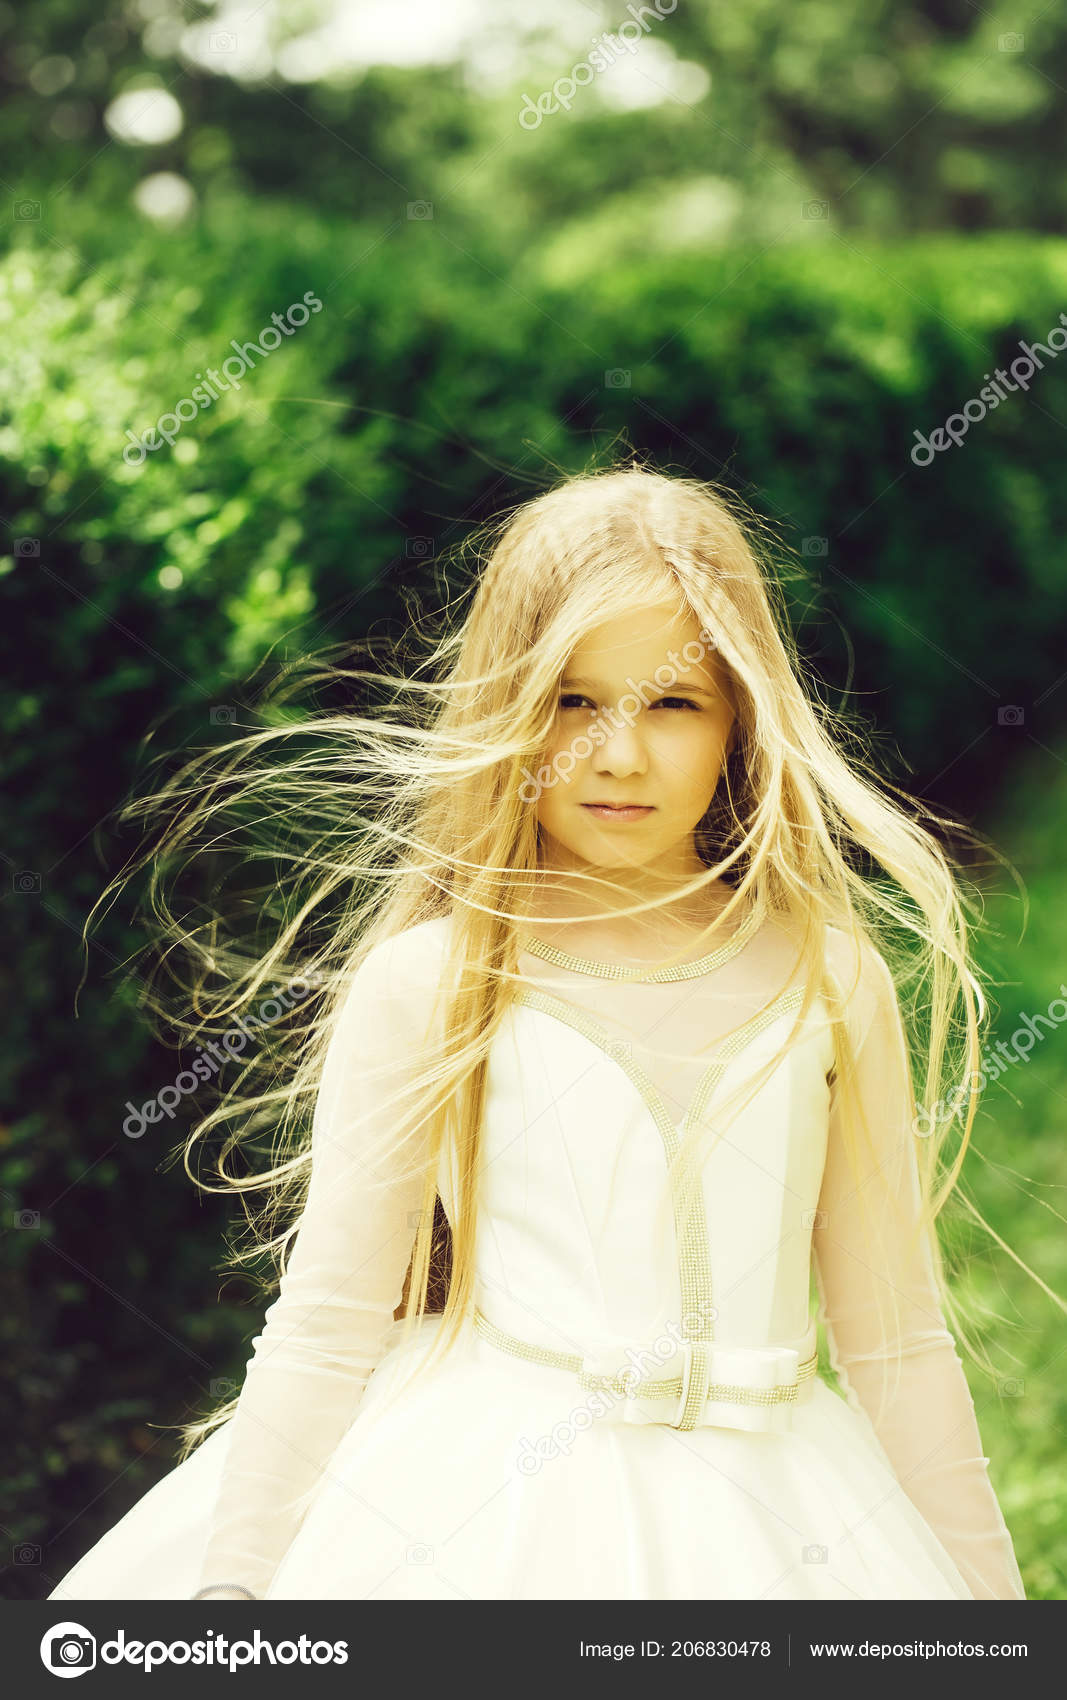 — Petite Robe Blanche Tverdohlib Photographie Air Fille En Plein 0X8NnkwOP